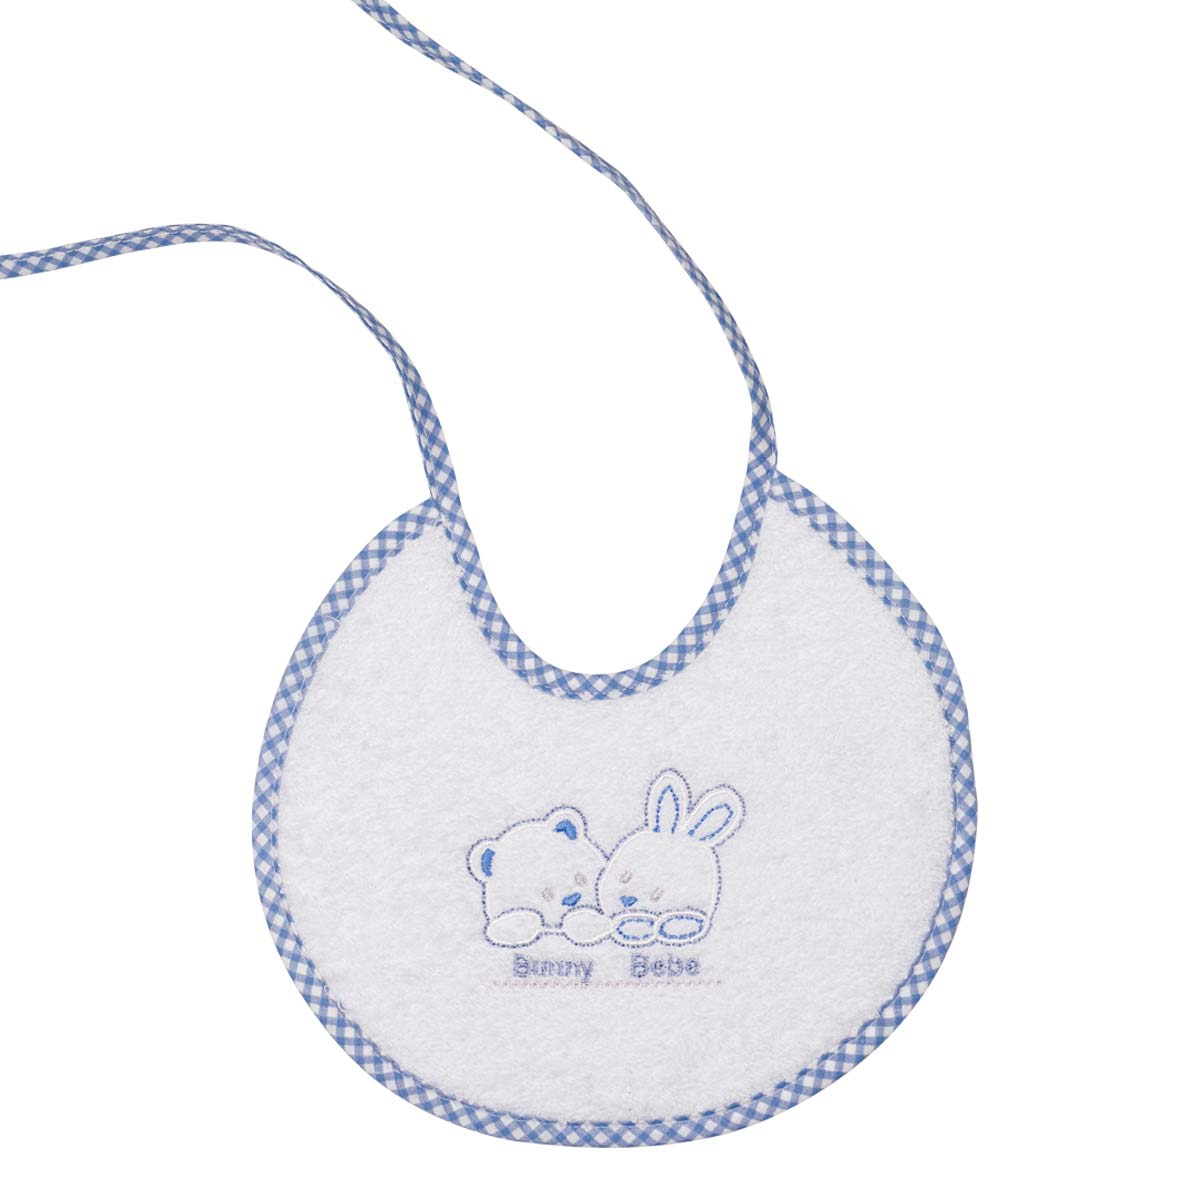 Bunny bebe σαλιάρα πετσετέ με ρέλι αρκουδάκια μπλε